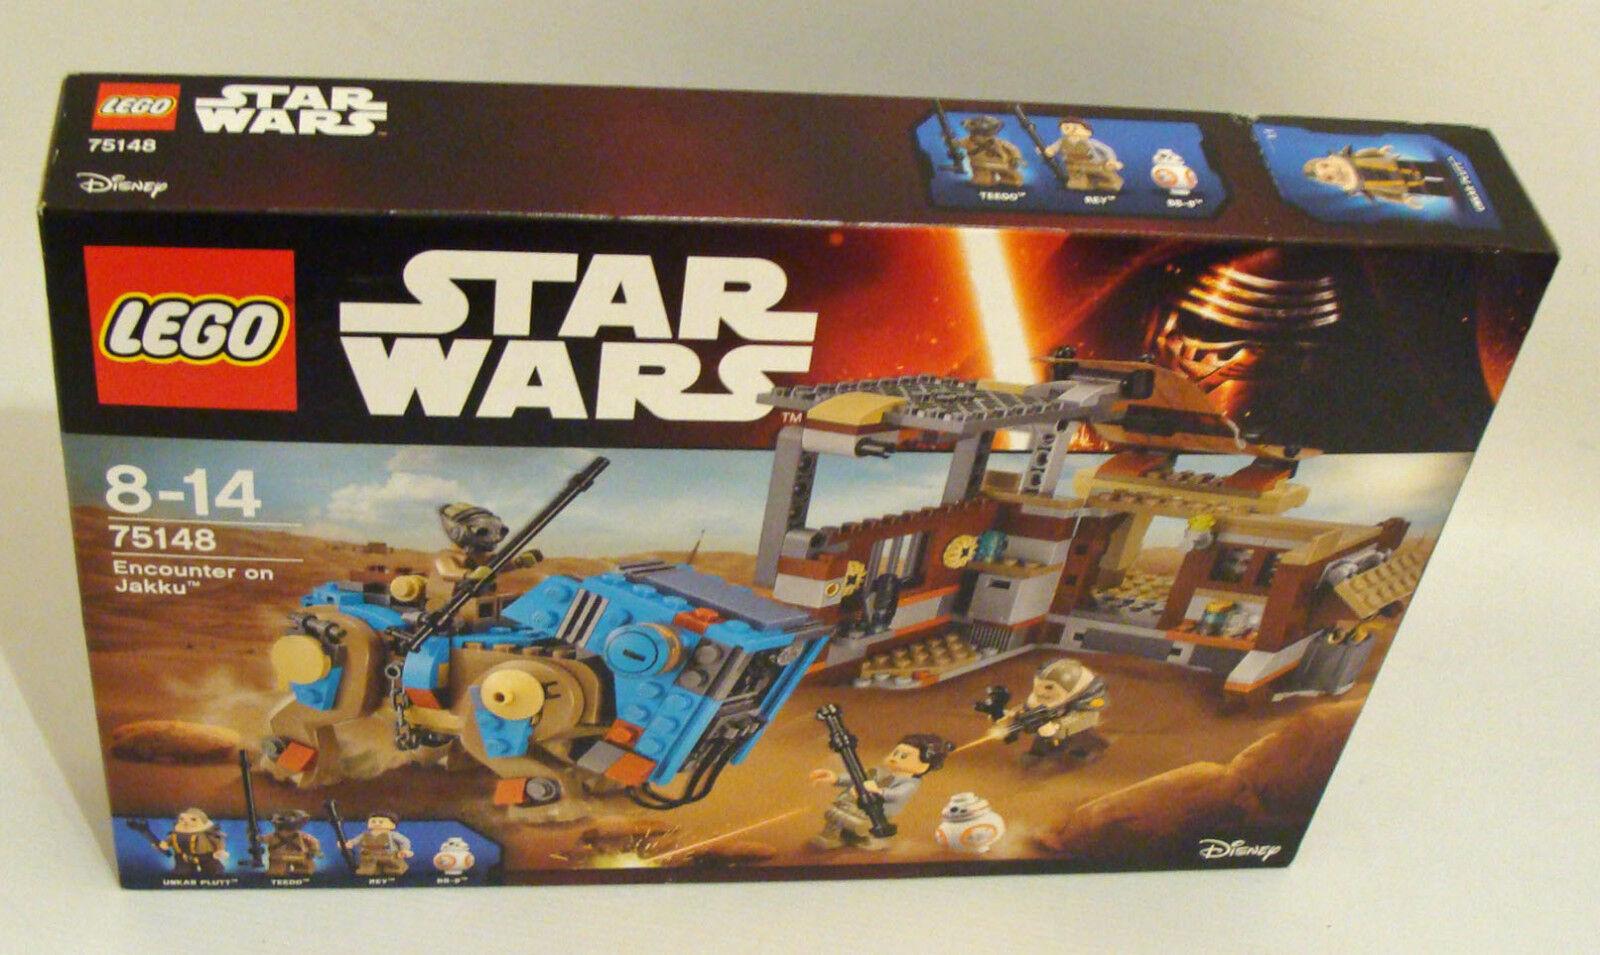 LEGO ® Star Wars 75148-Encounter on Jakku 530 parti 8-14 ANNI-NUOVO